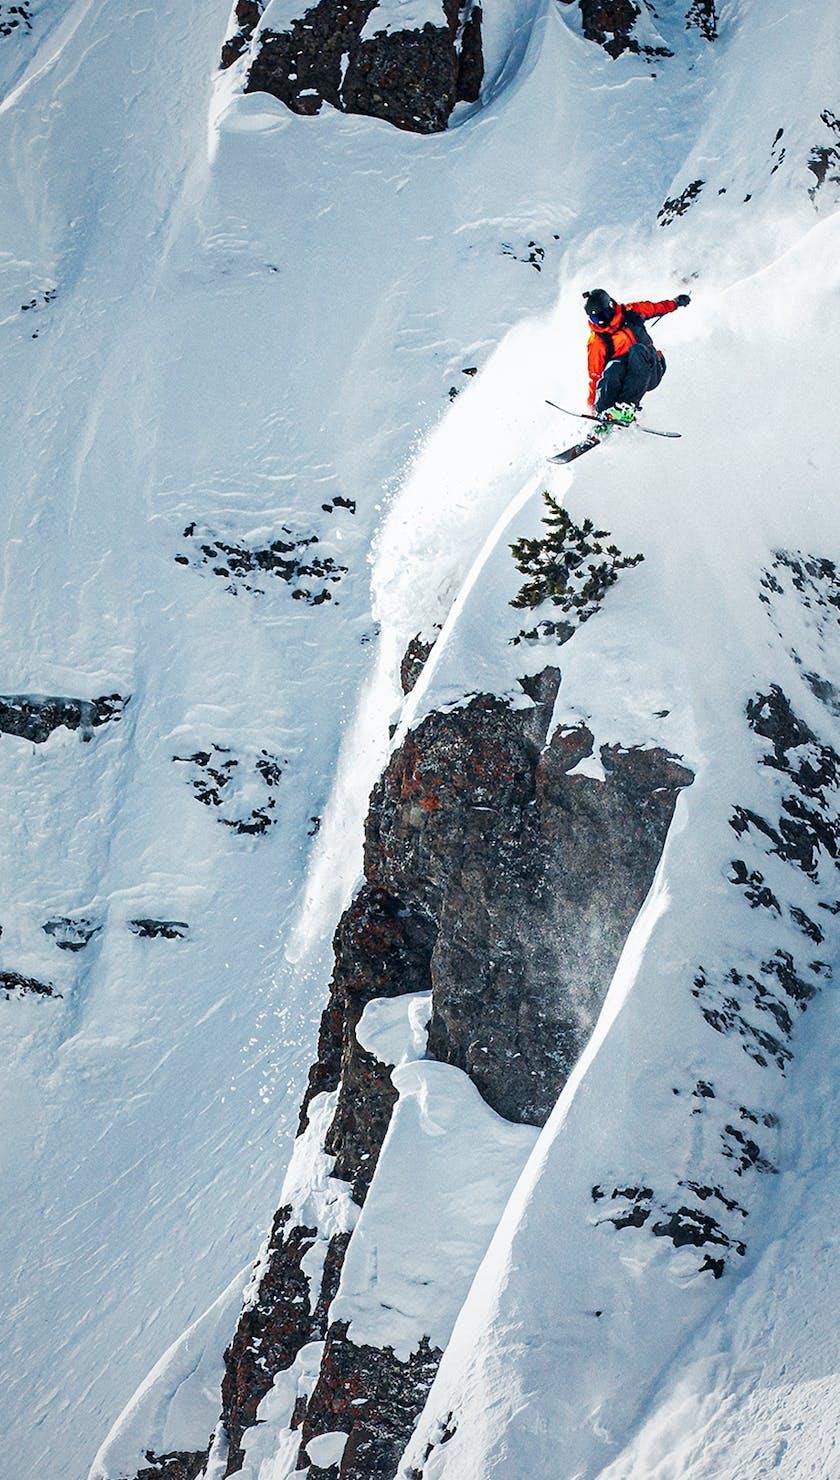 BD Athlete Parkin Costain sending it off a cliff